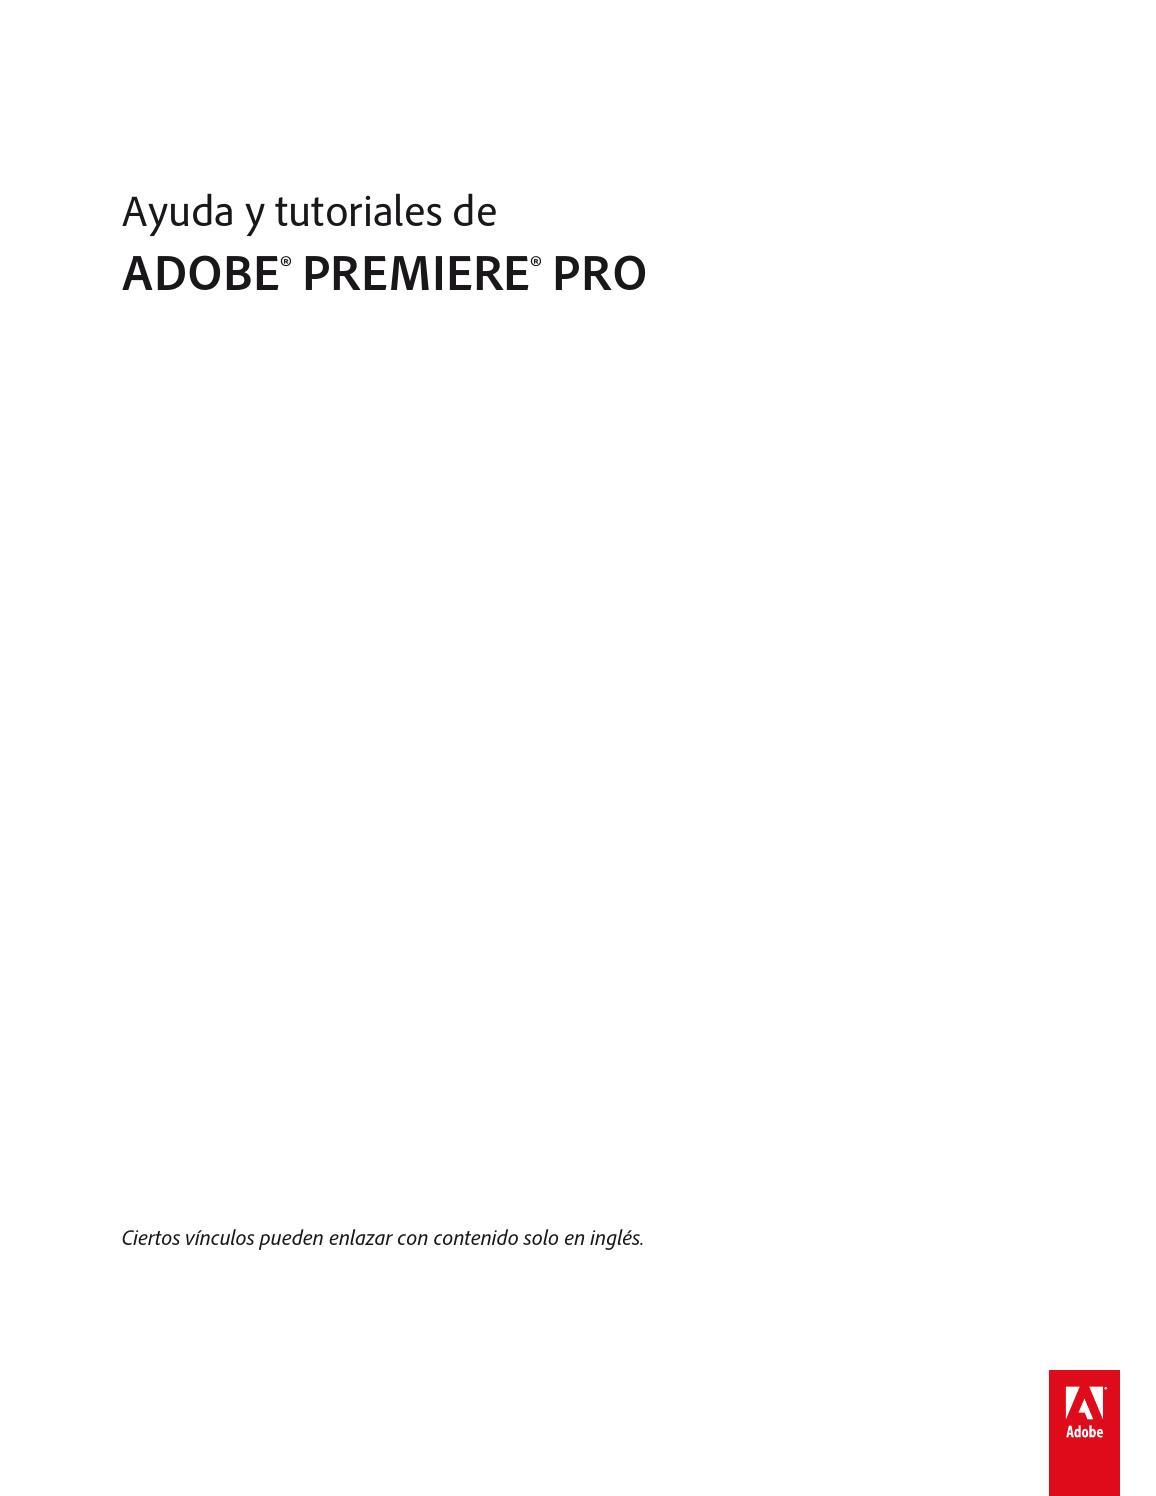 Manual adobe premiere cs6 by Adan Arturo Isidro Torres - issuu